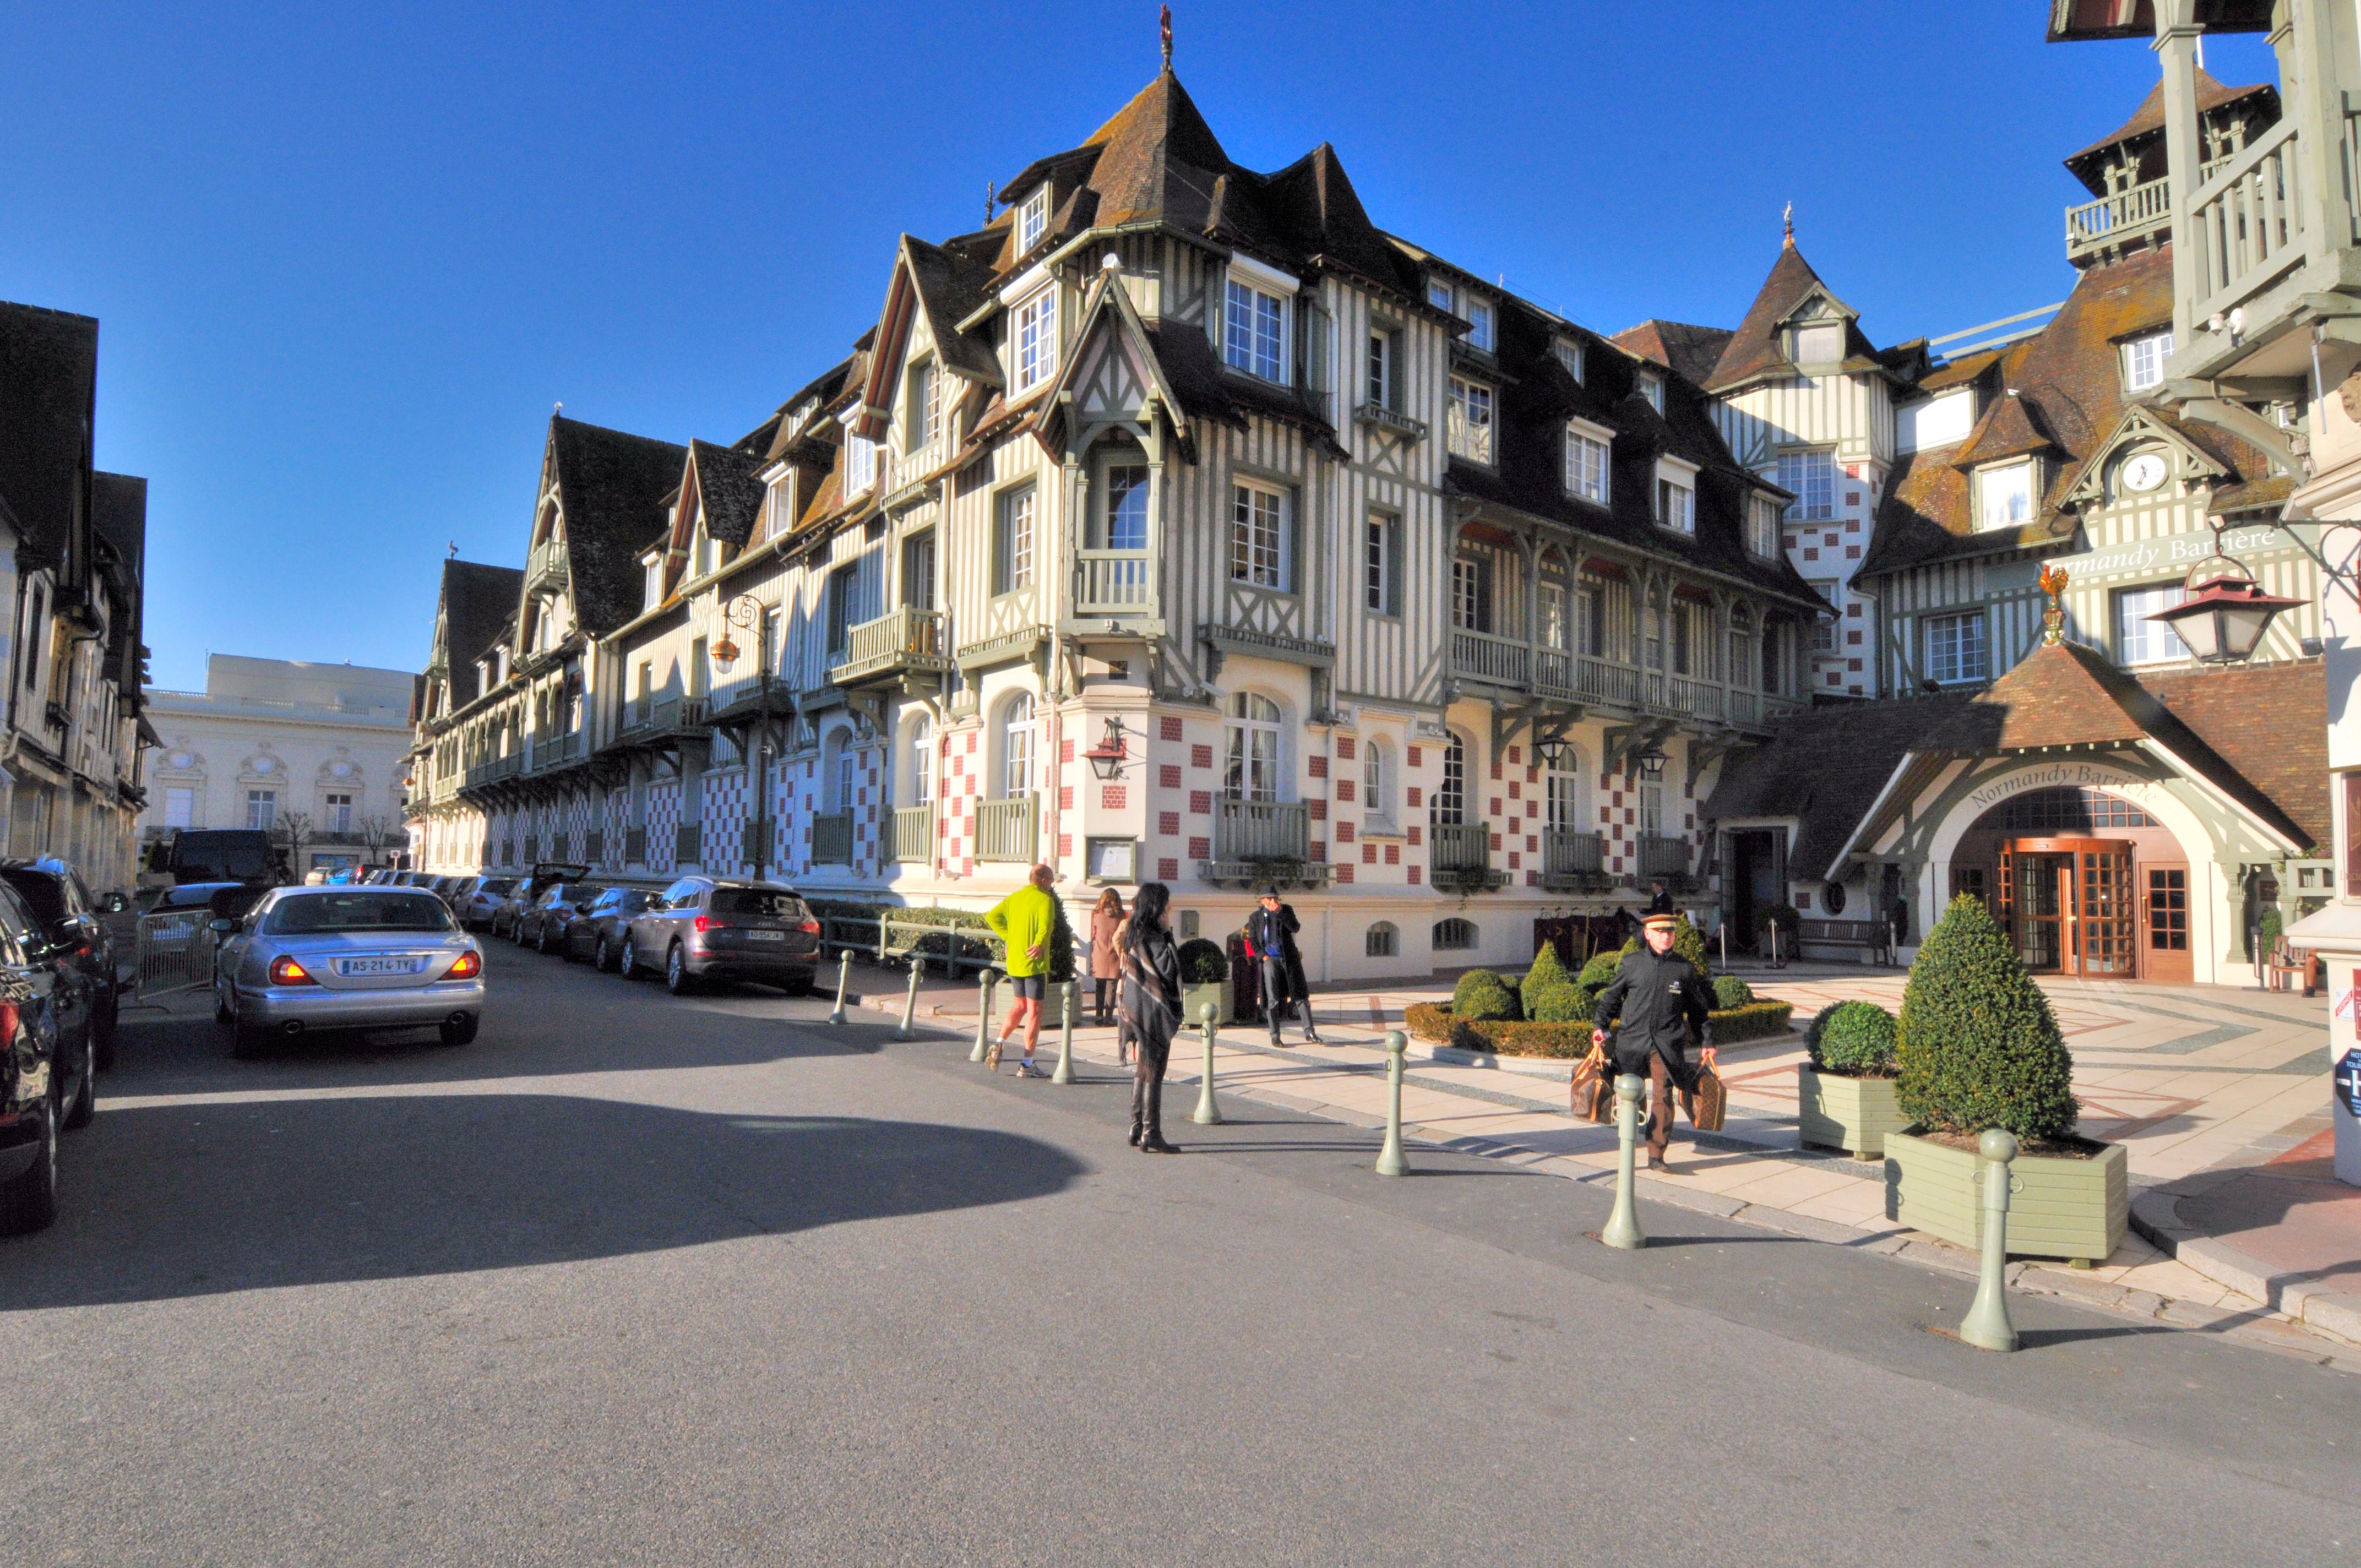 Datei normandy barri re deauville 8014 jpg wikipedia for Design hotel normandie france